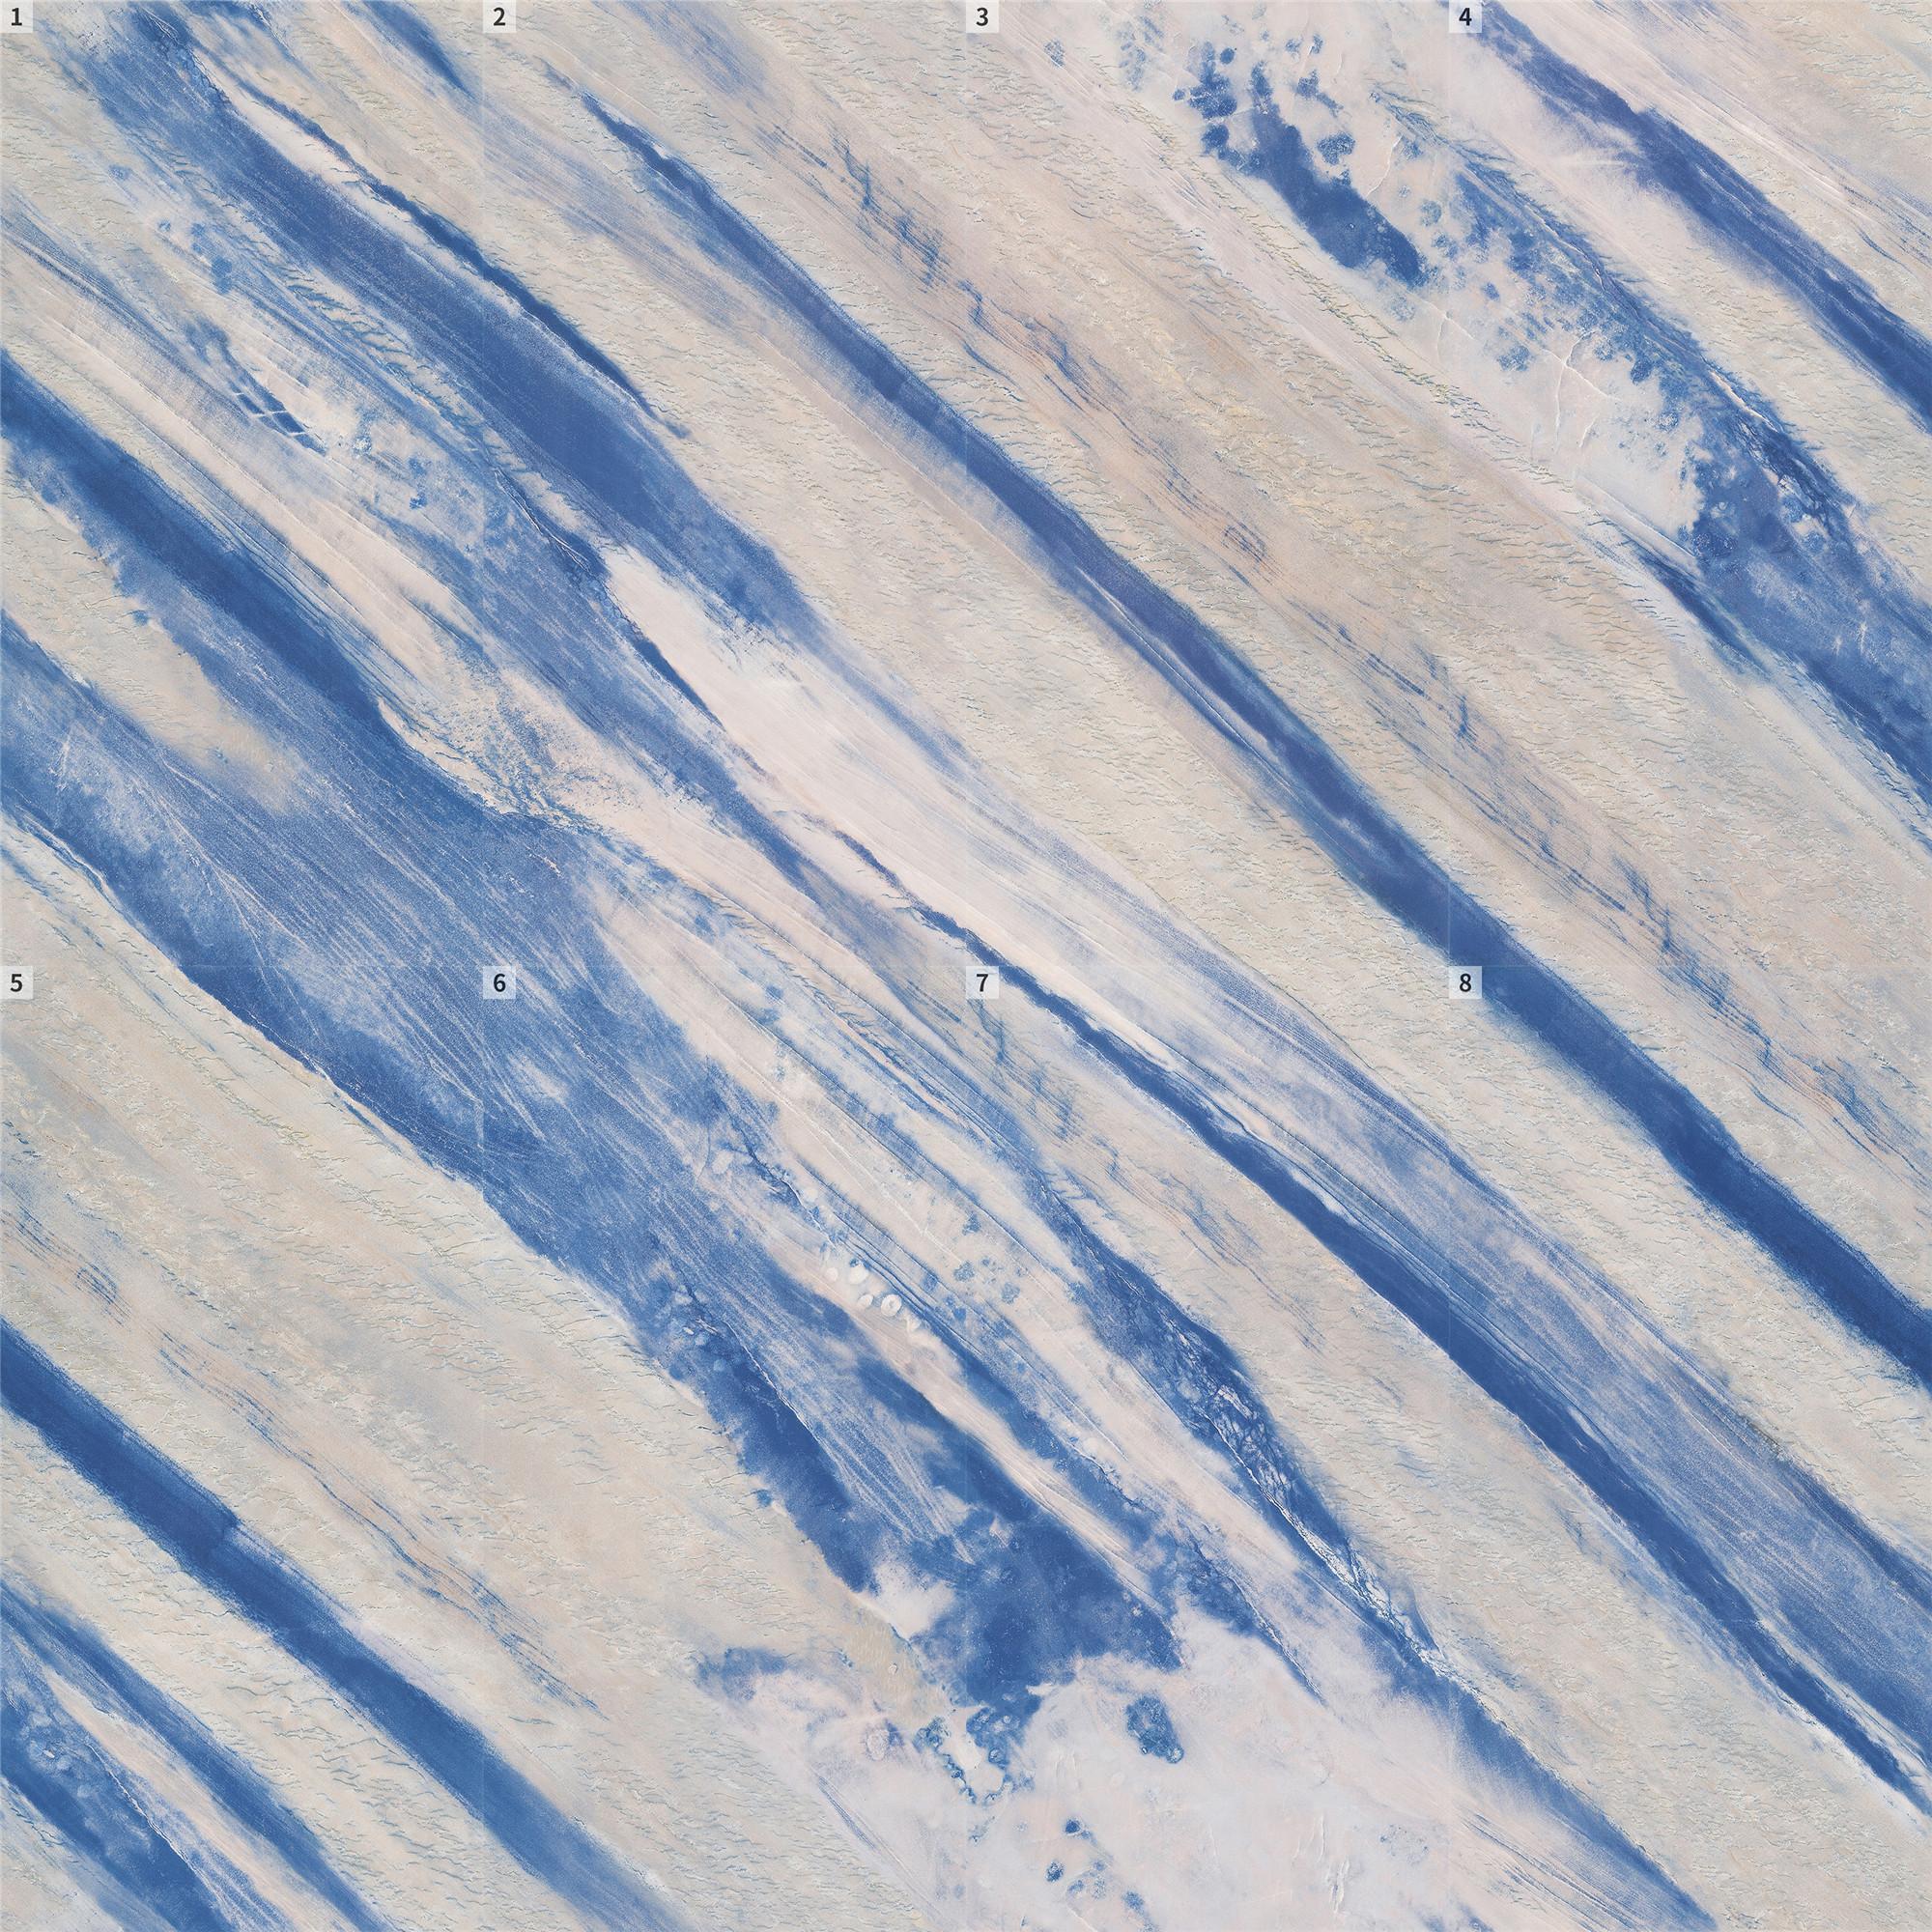 Azulejos de mármol azul Azul Macaubas